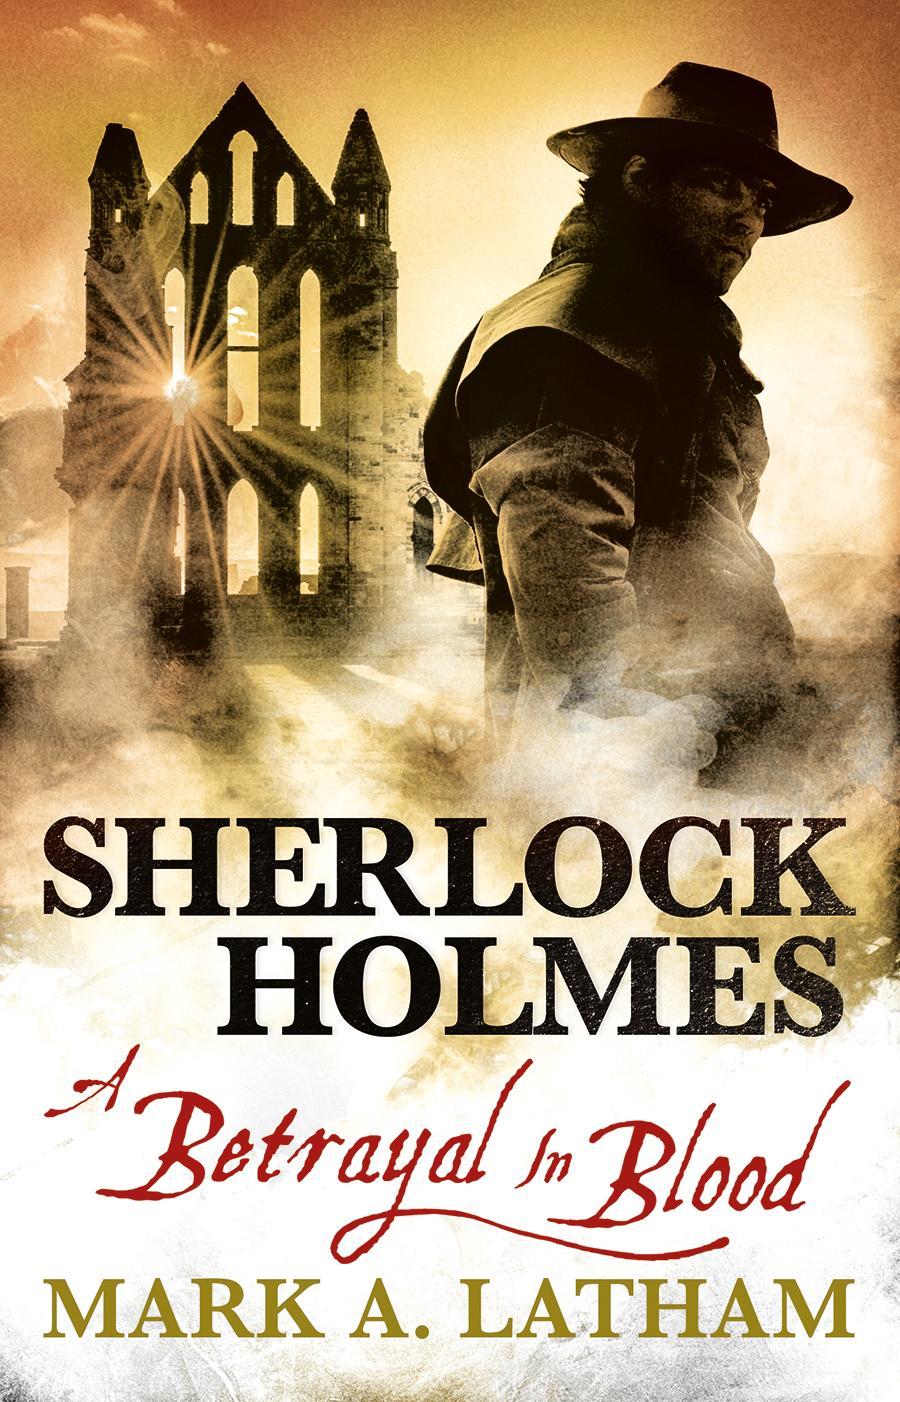 Sherlock Holmes - A Betrayal in Blood dayle a c the adventures of sherlock holmes рассказы на английском языке